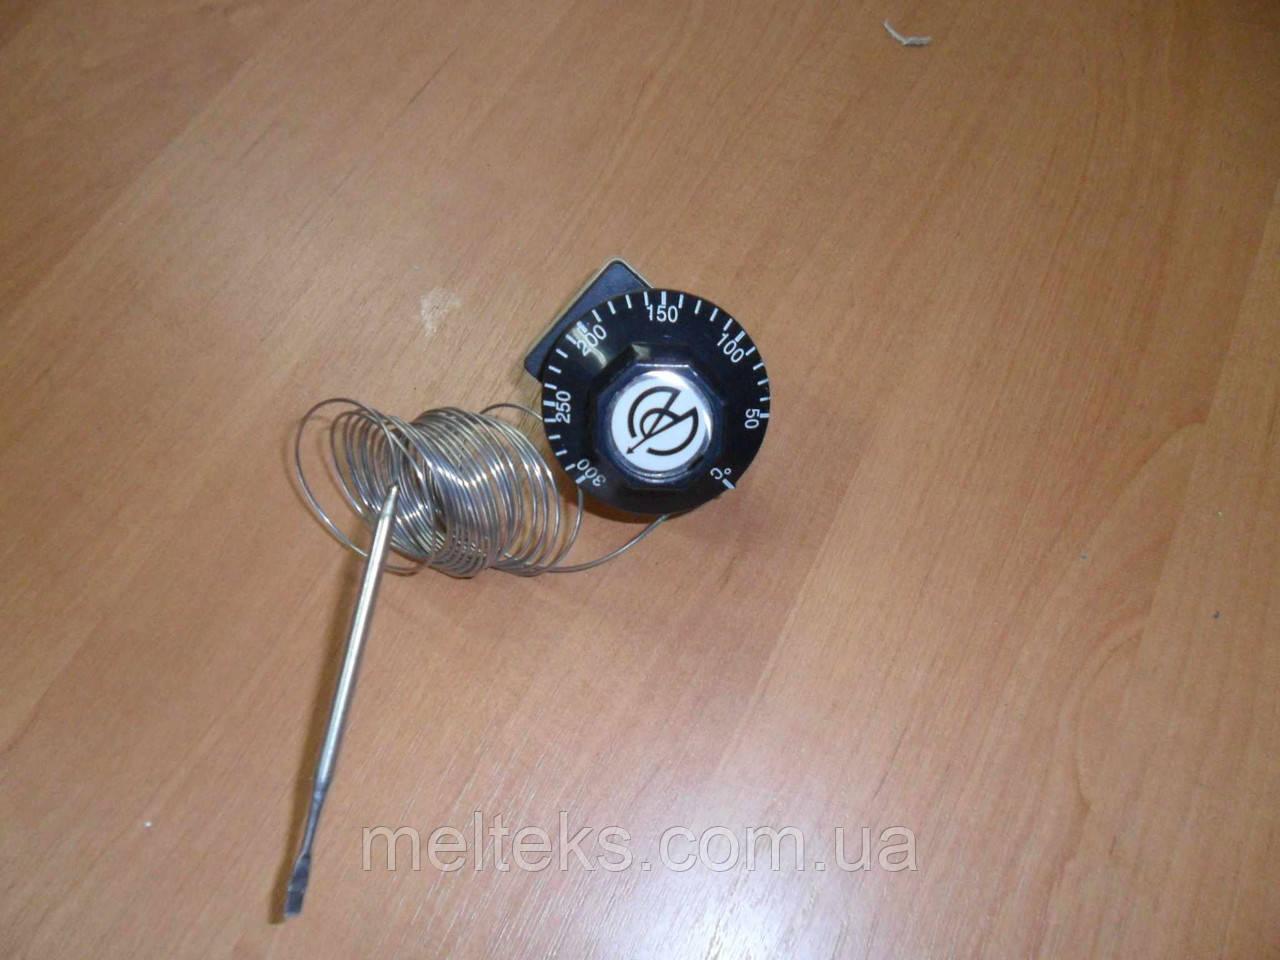 Терморегулятор MMG для промышл. жарочных шкафов